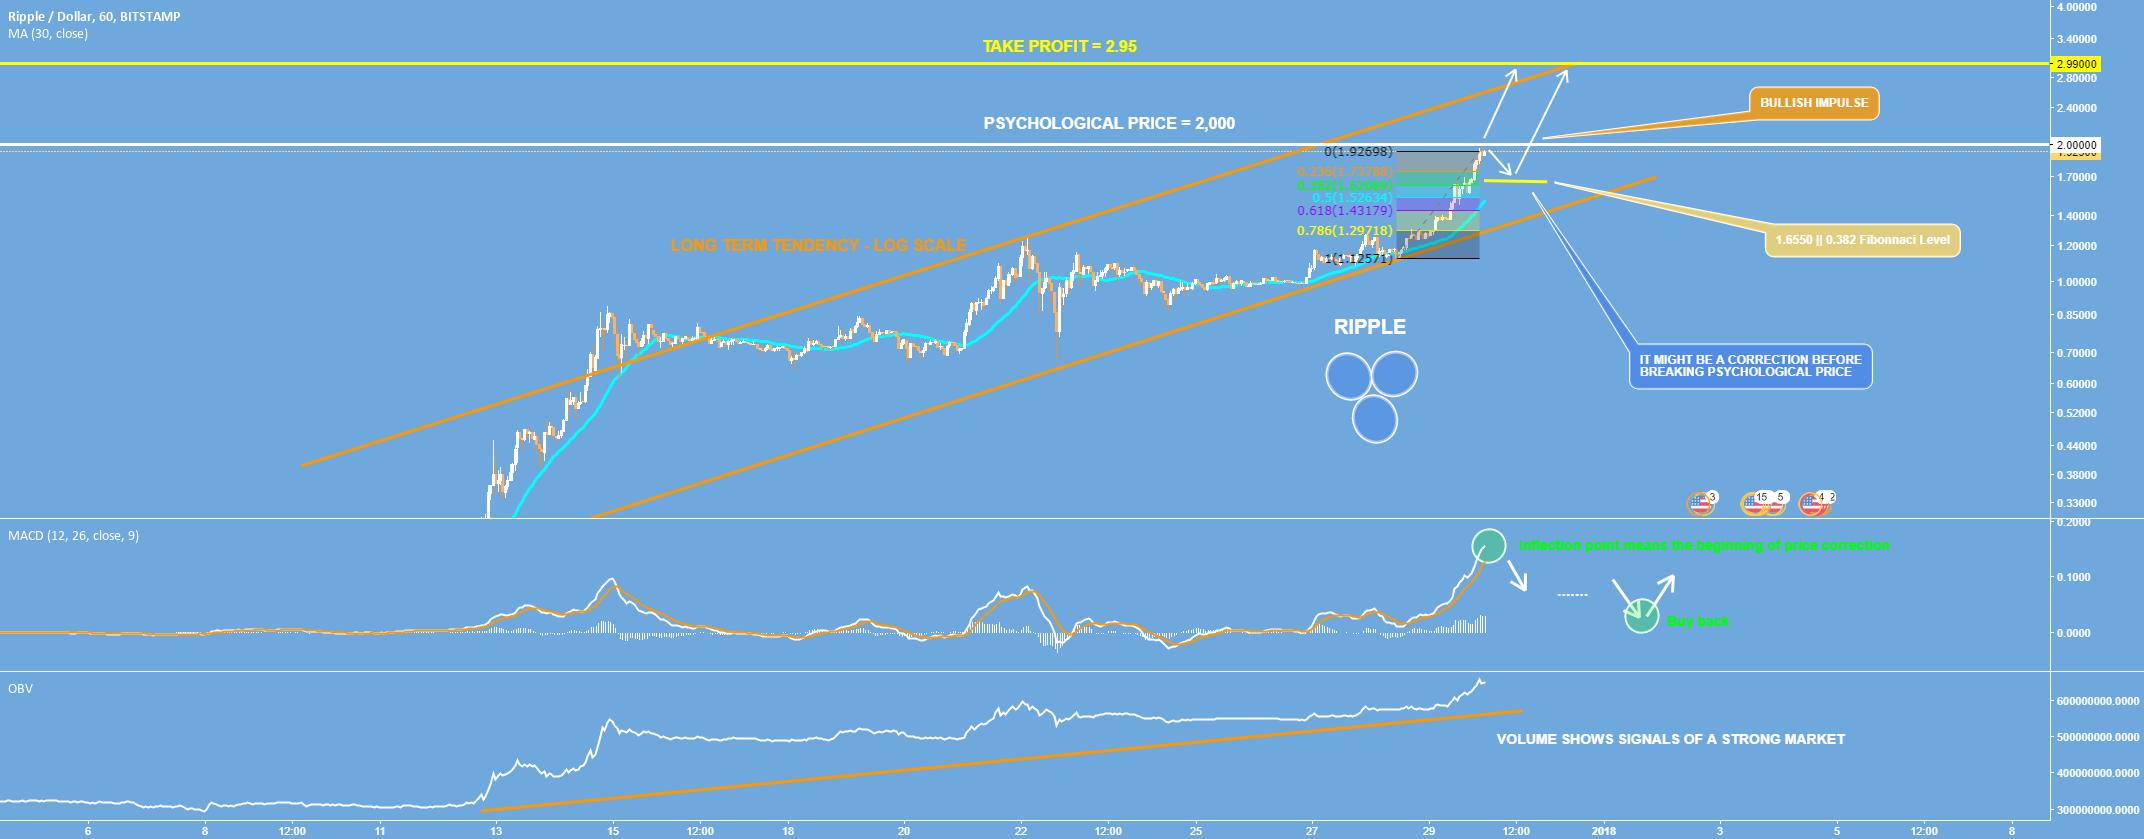 Ripple - The New Bitcoin - 3$